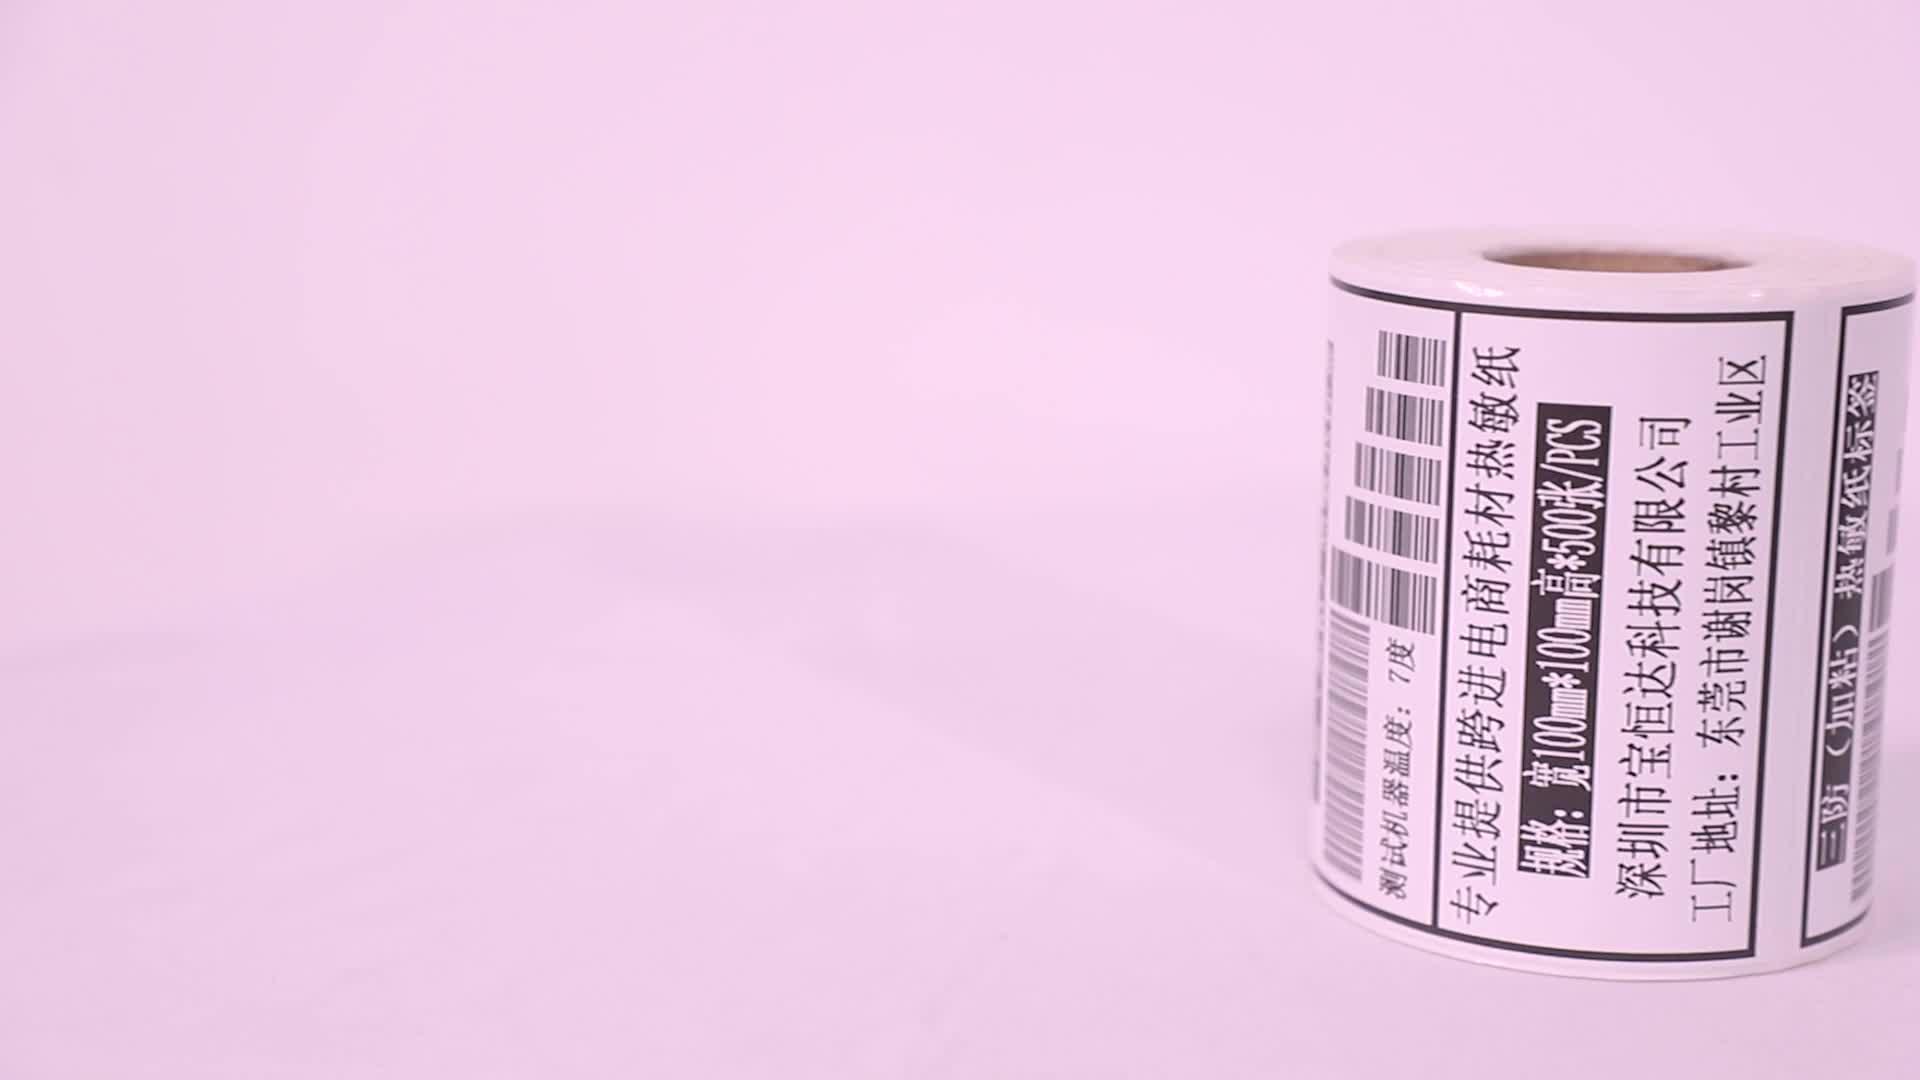 4X6ที่กำหนดเองสีขาวกาวตนเองการจัดส่งสินค้าบาร์โค้ดกระดาษโดยตรงโอนความร้อนบรรจุภัณฑ์สติกเกอร์ฉลาก